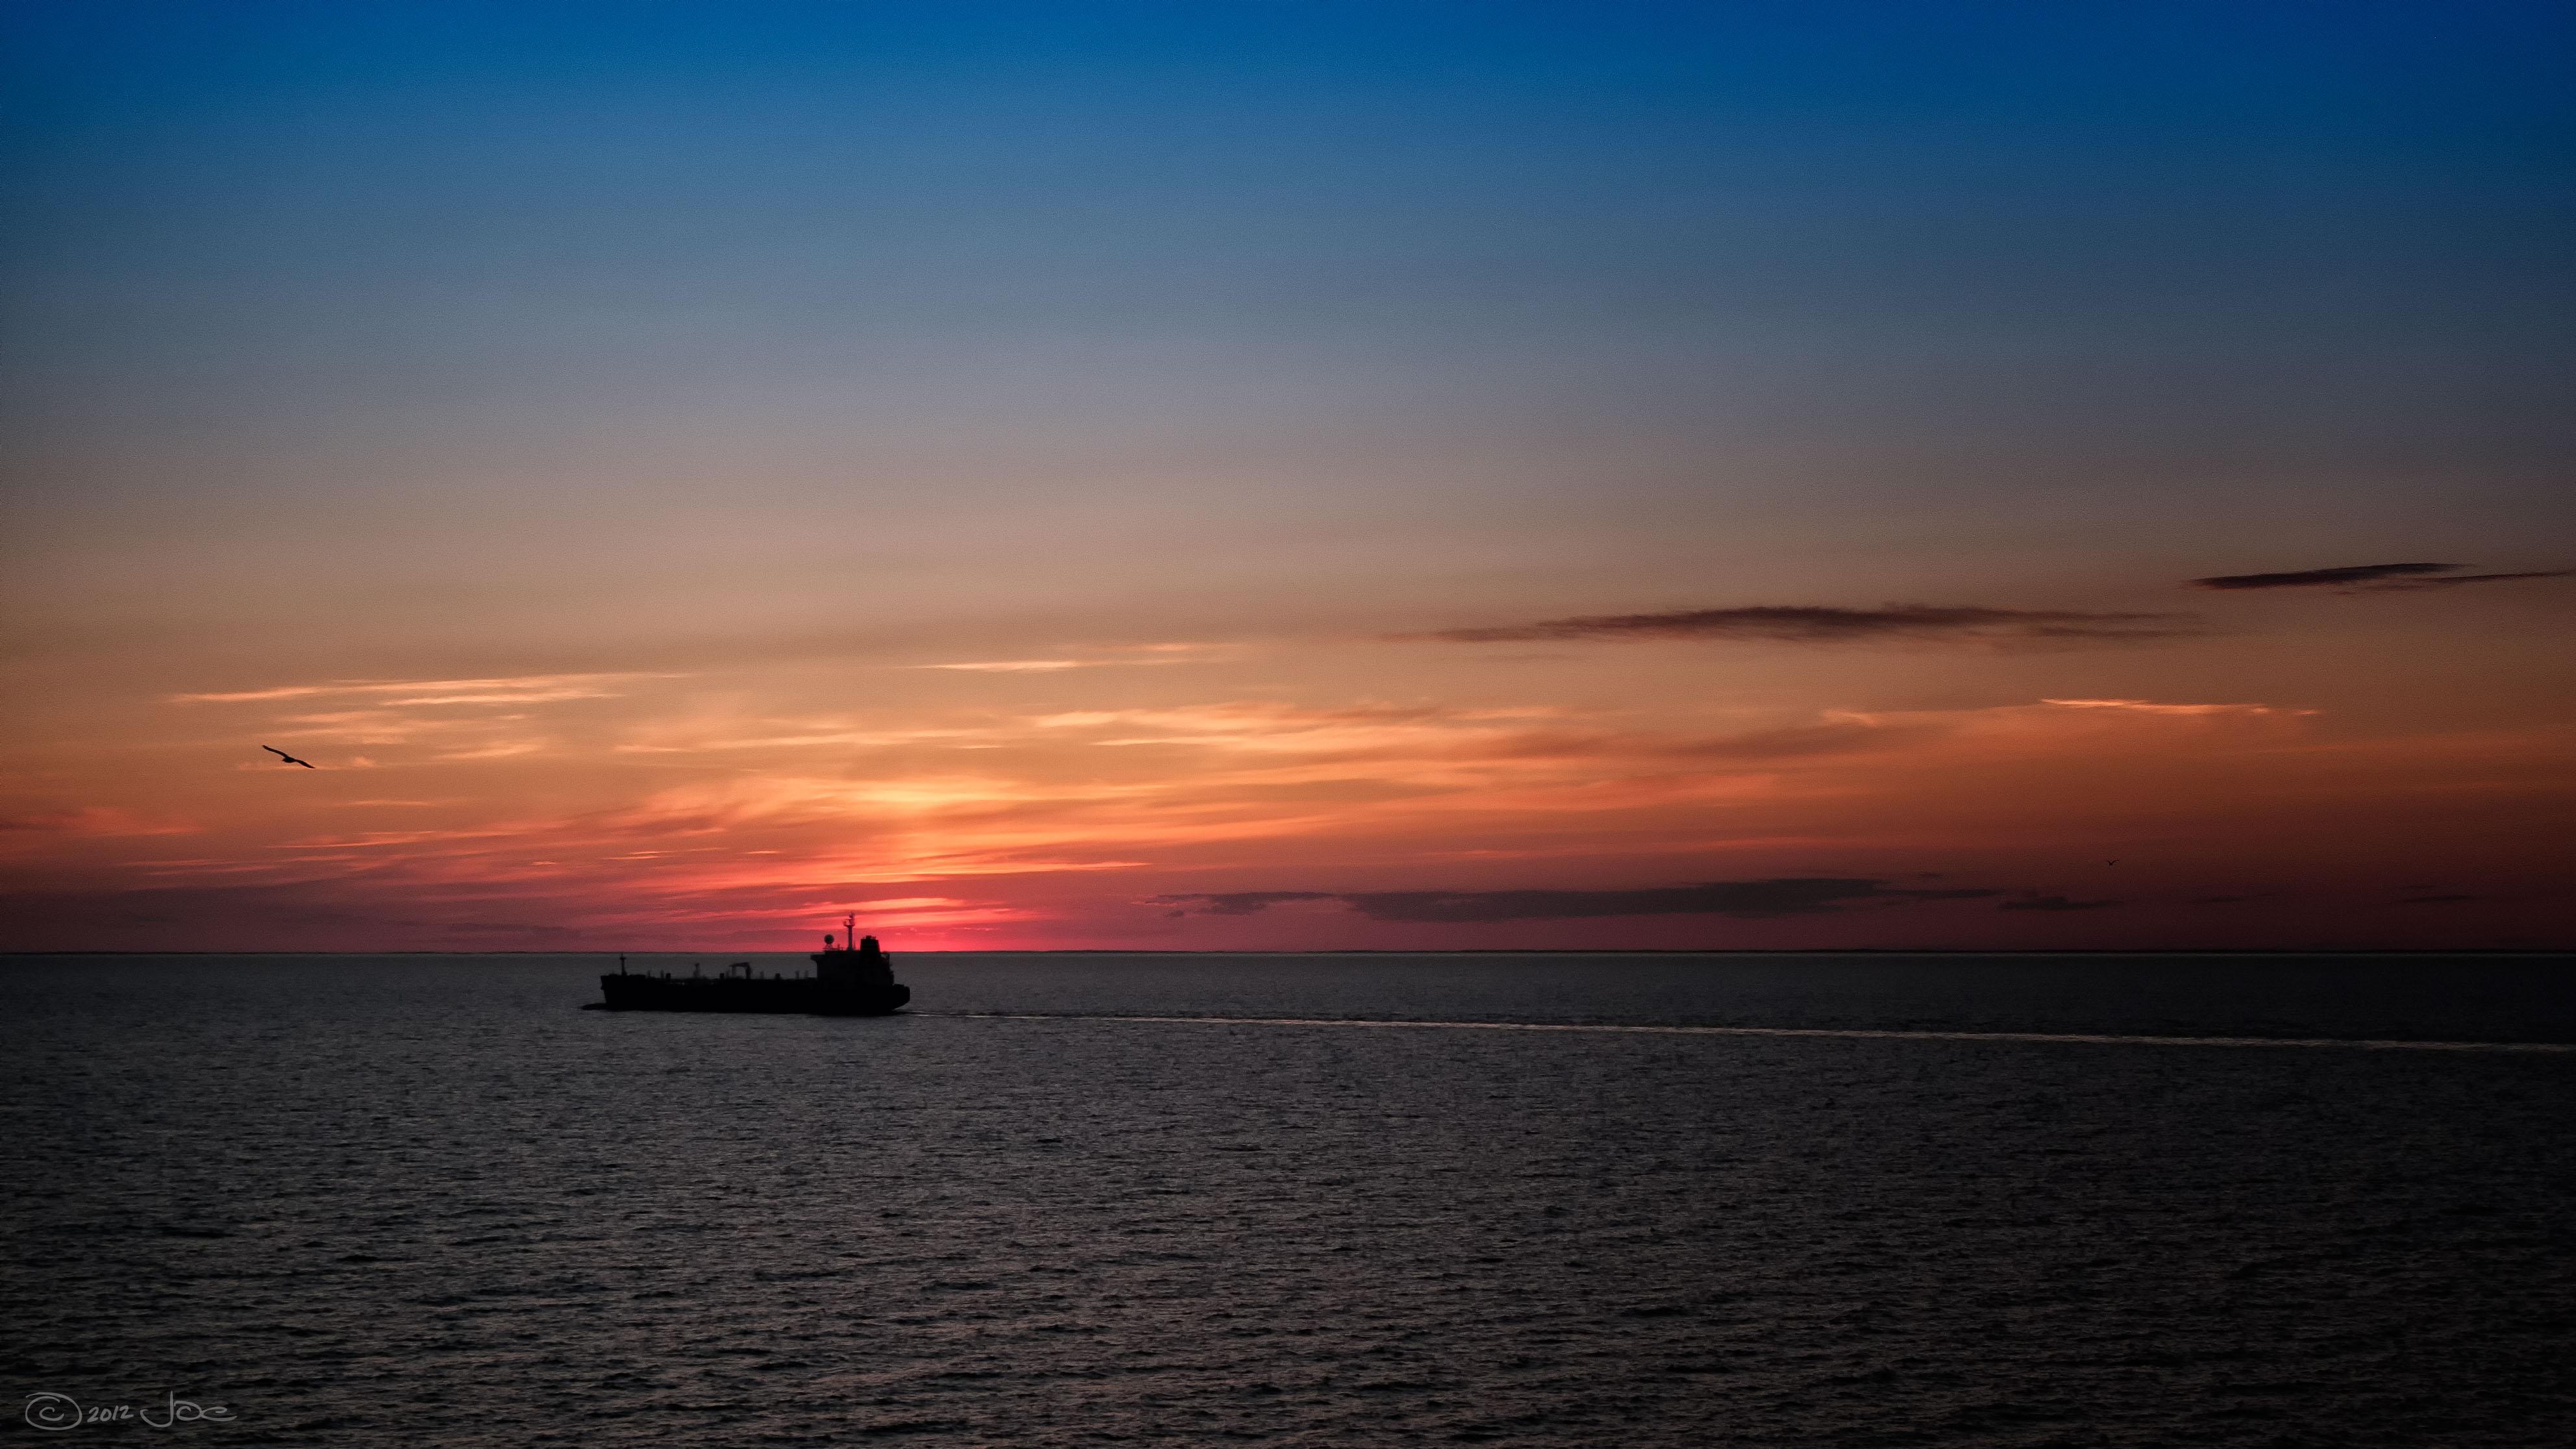 Sunset on the Baltic Sea, Baltic, Cloud, Costa, Dusk, HQ Photo